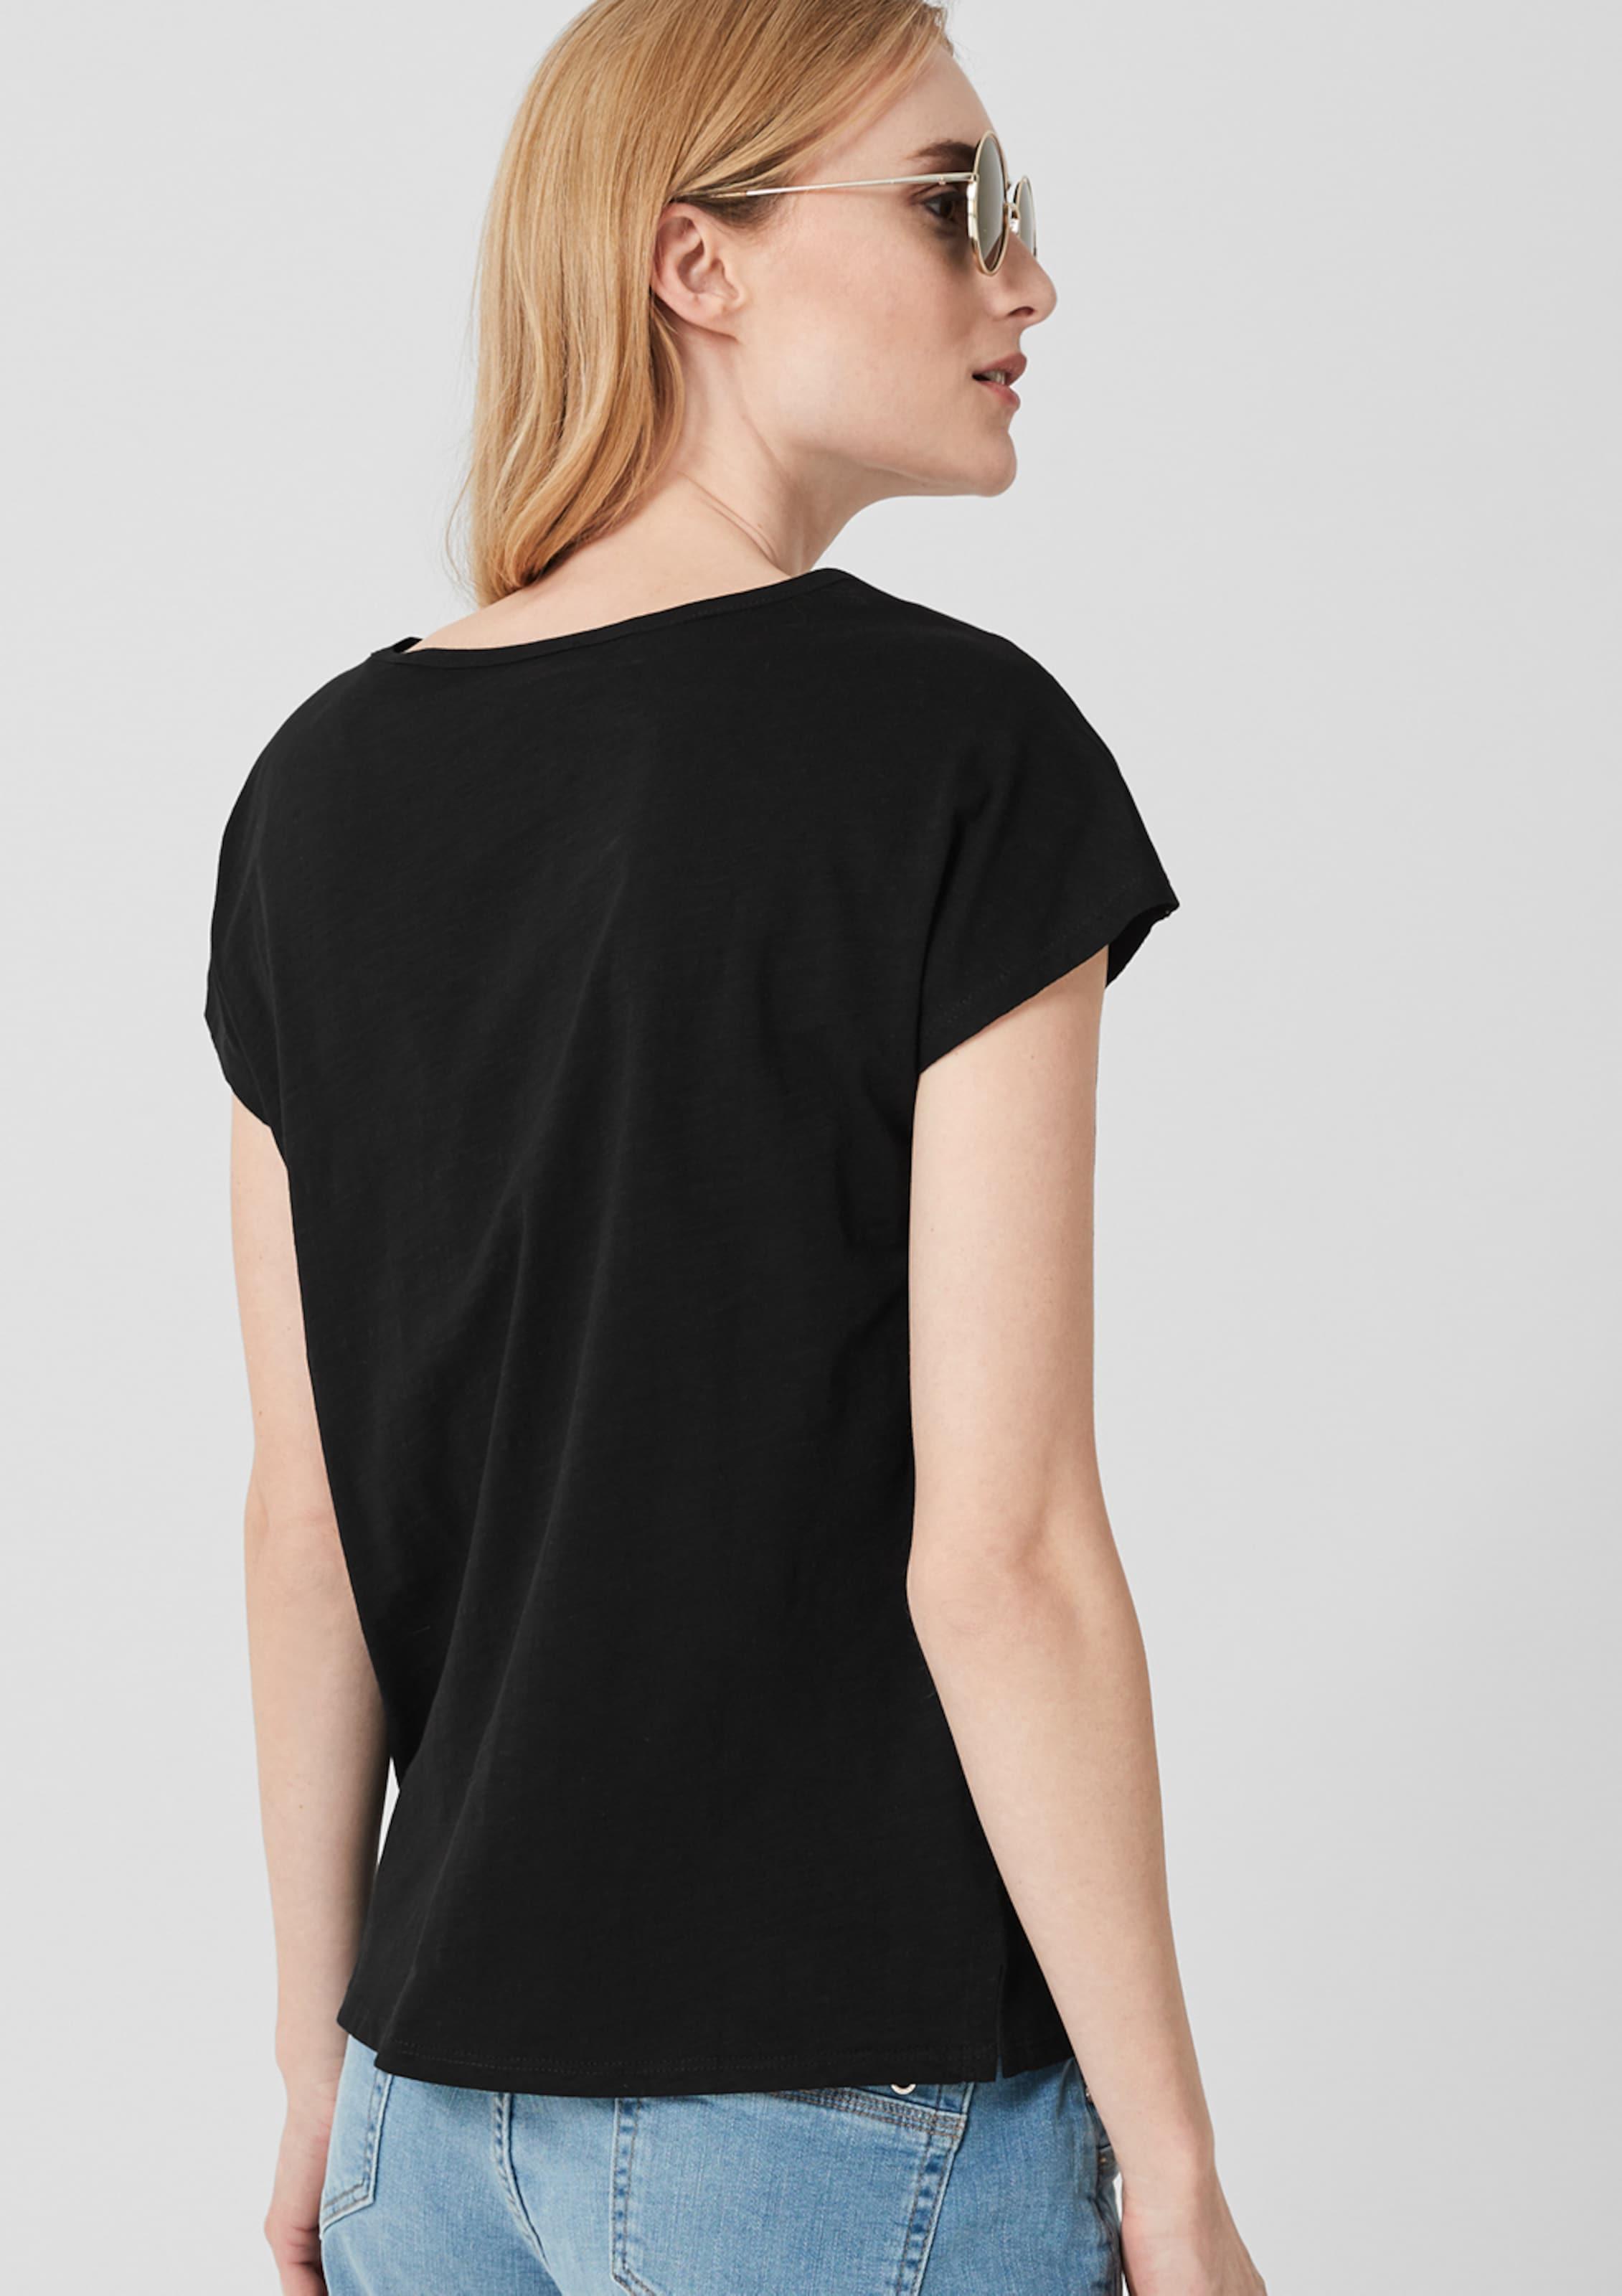 Red In Schwarz Label oliver shirt T S k0P8nOw